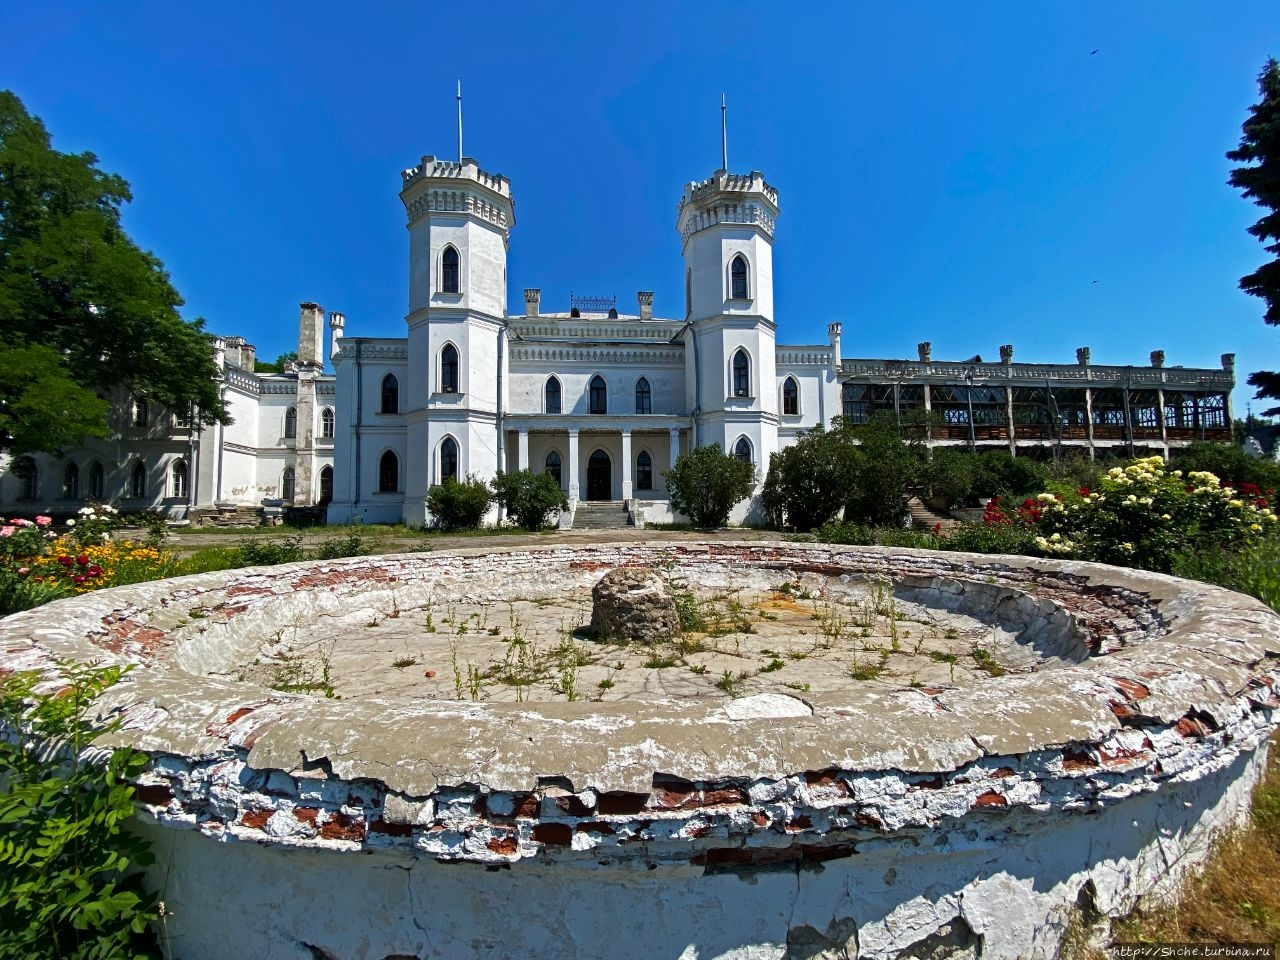 Шаровский дворец Шаровка, Украина